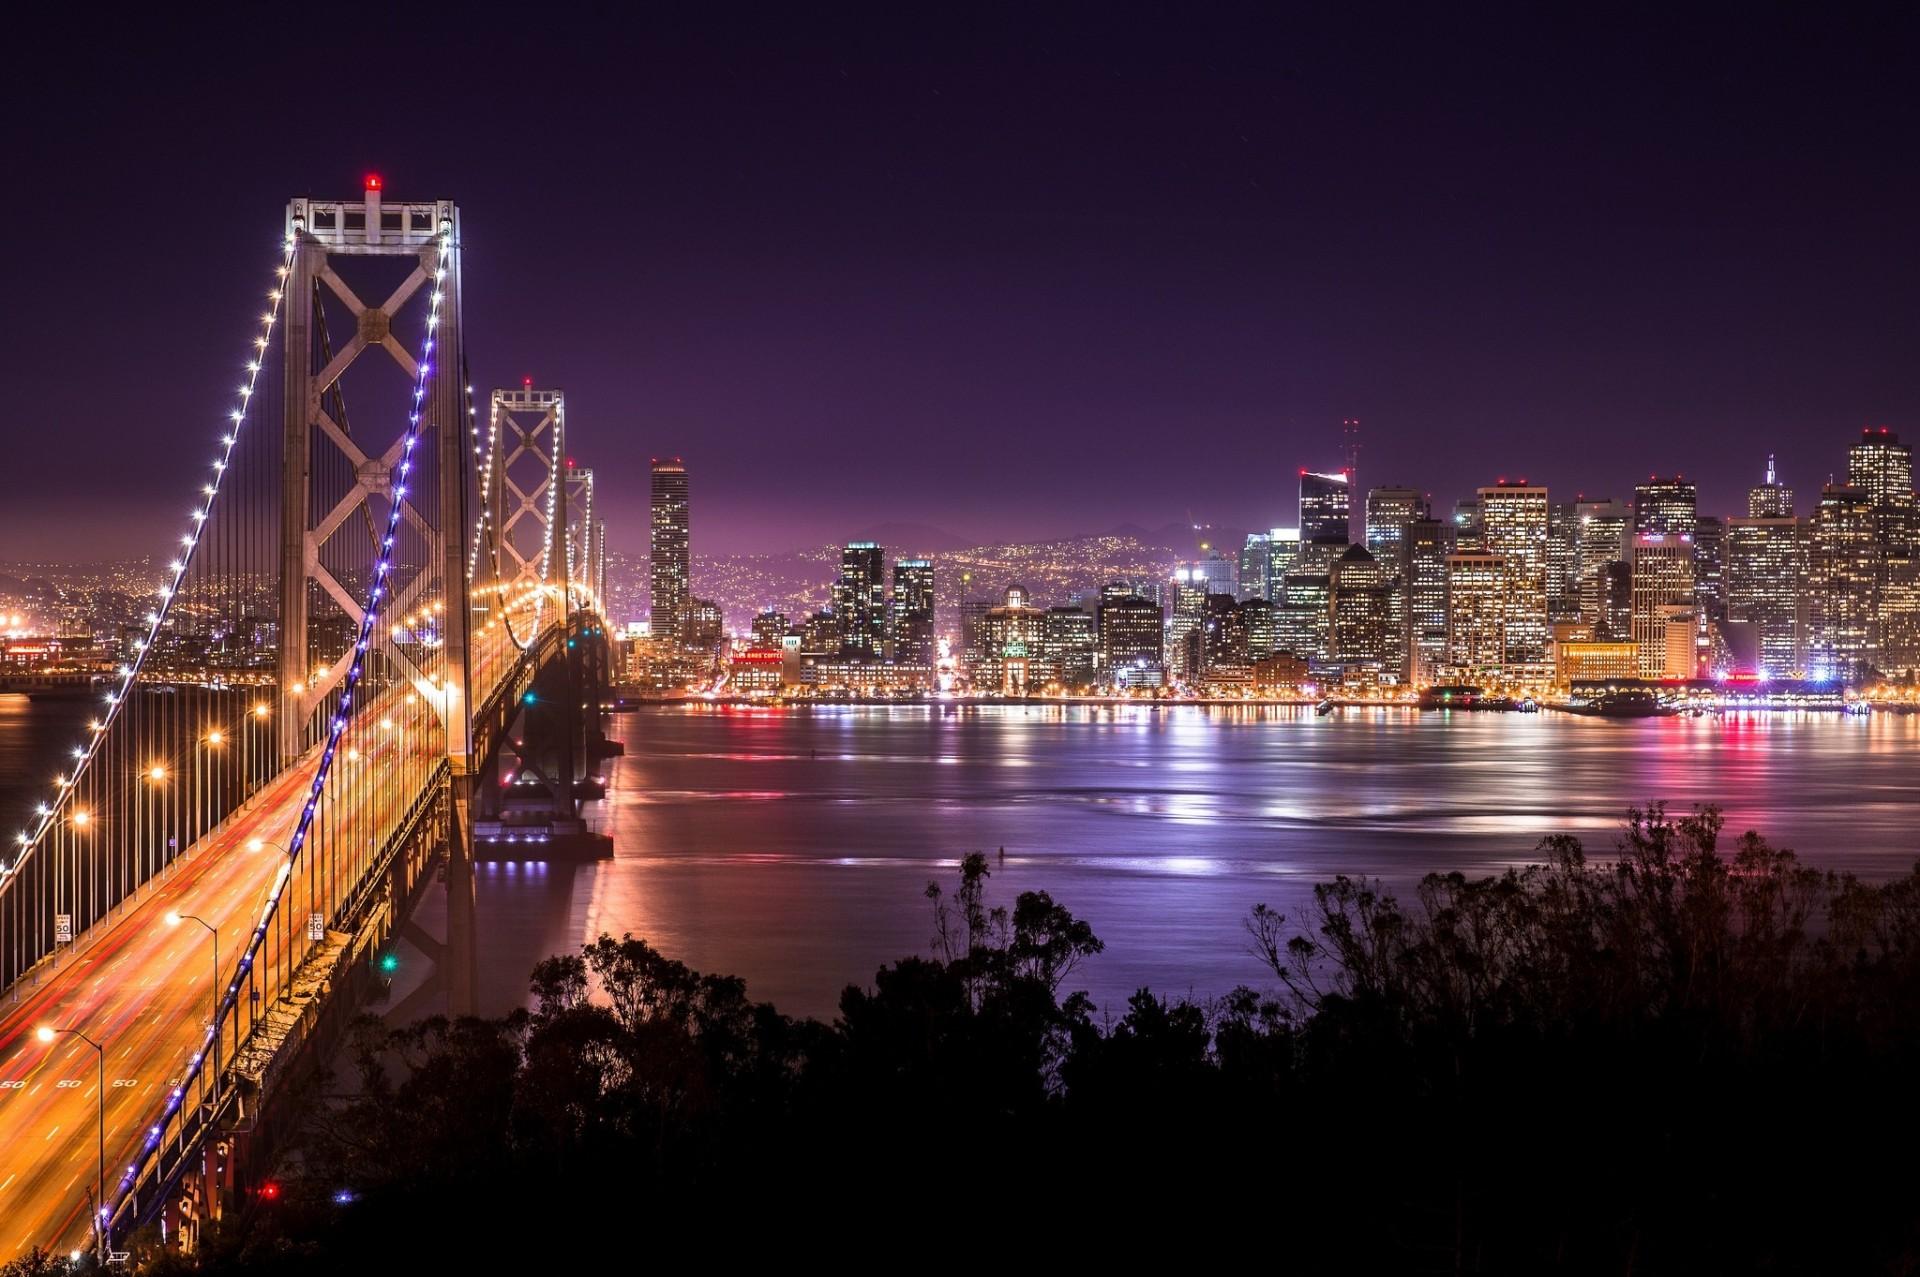 страны архитектура вечер США Сан-Франциско country architecture evening USA San Francisco CA загрузить